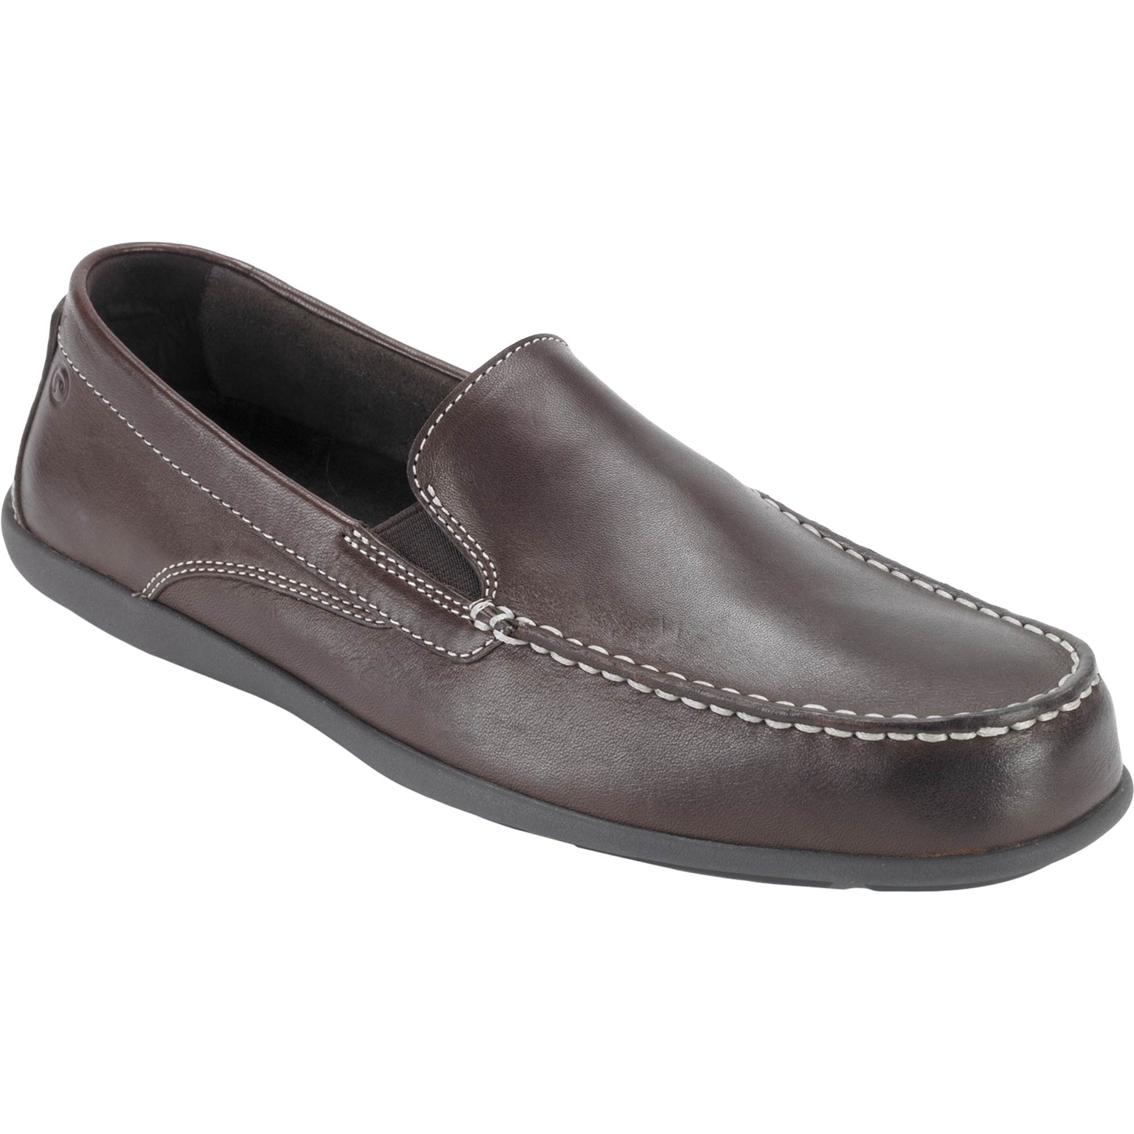 Rockport Men's Cape Noble II Casual Shoes